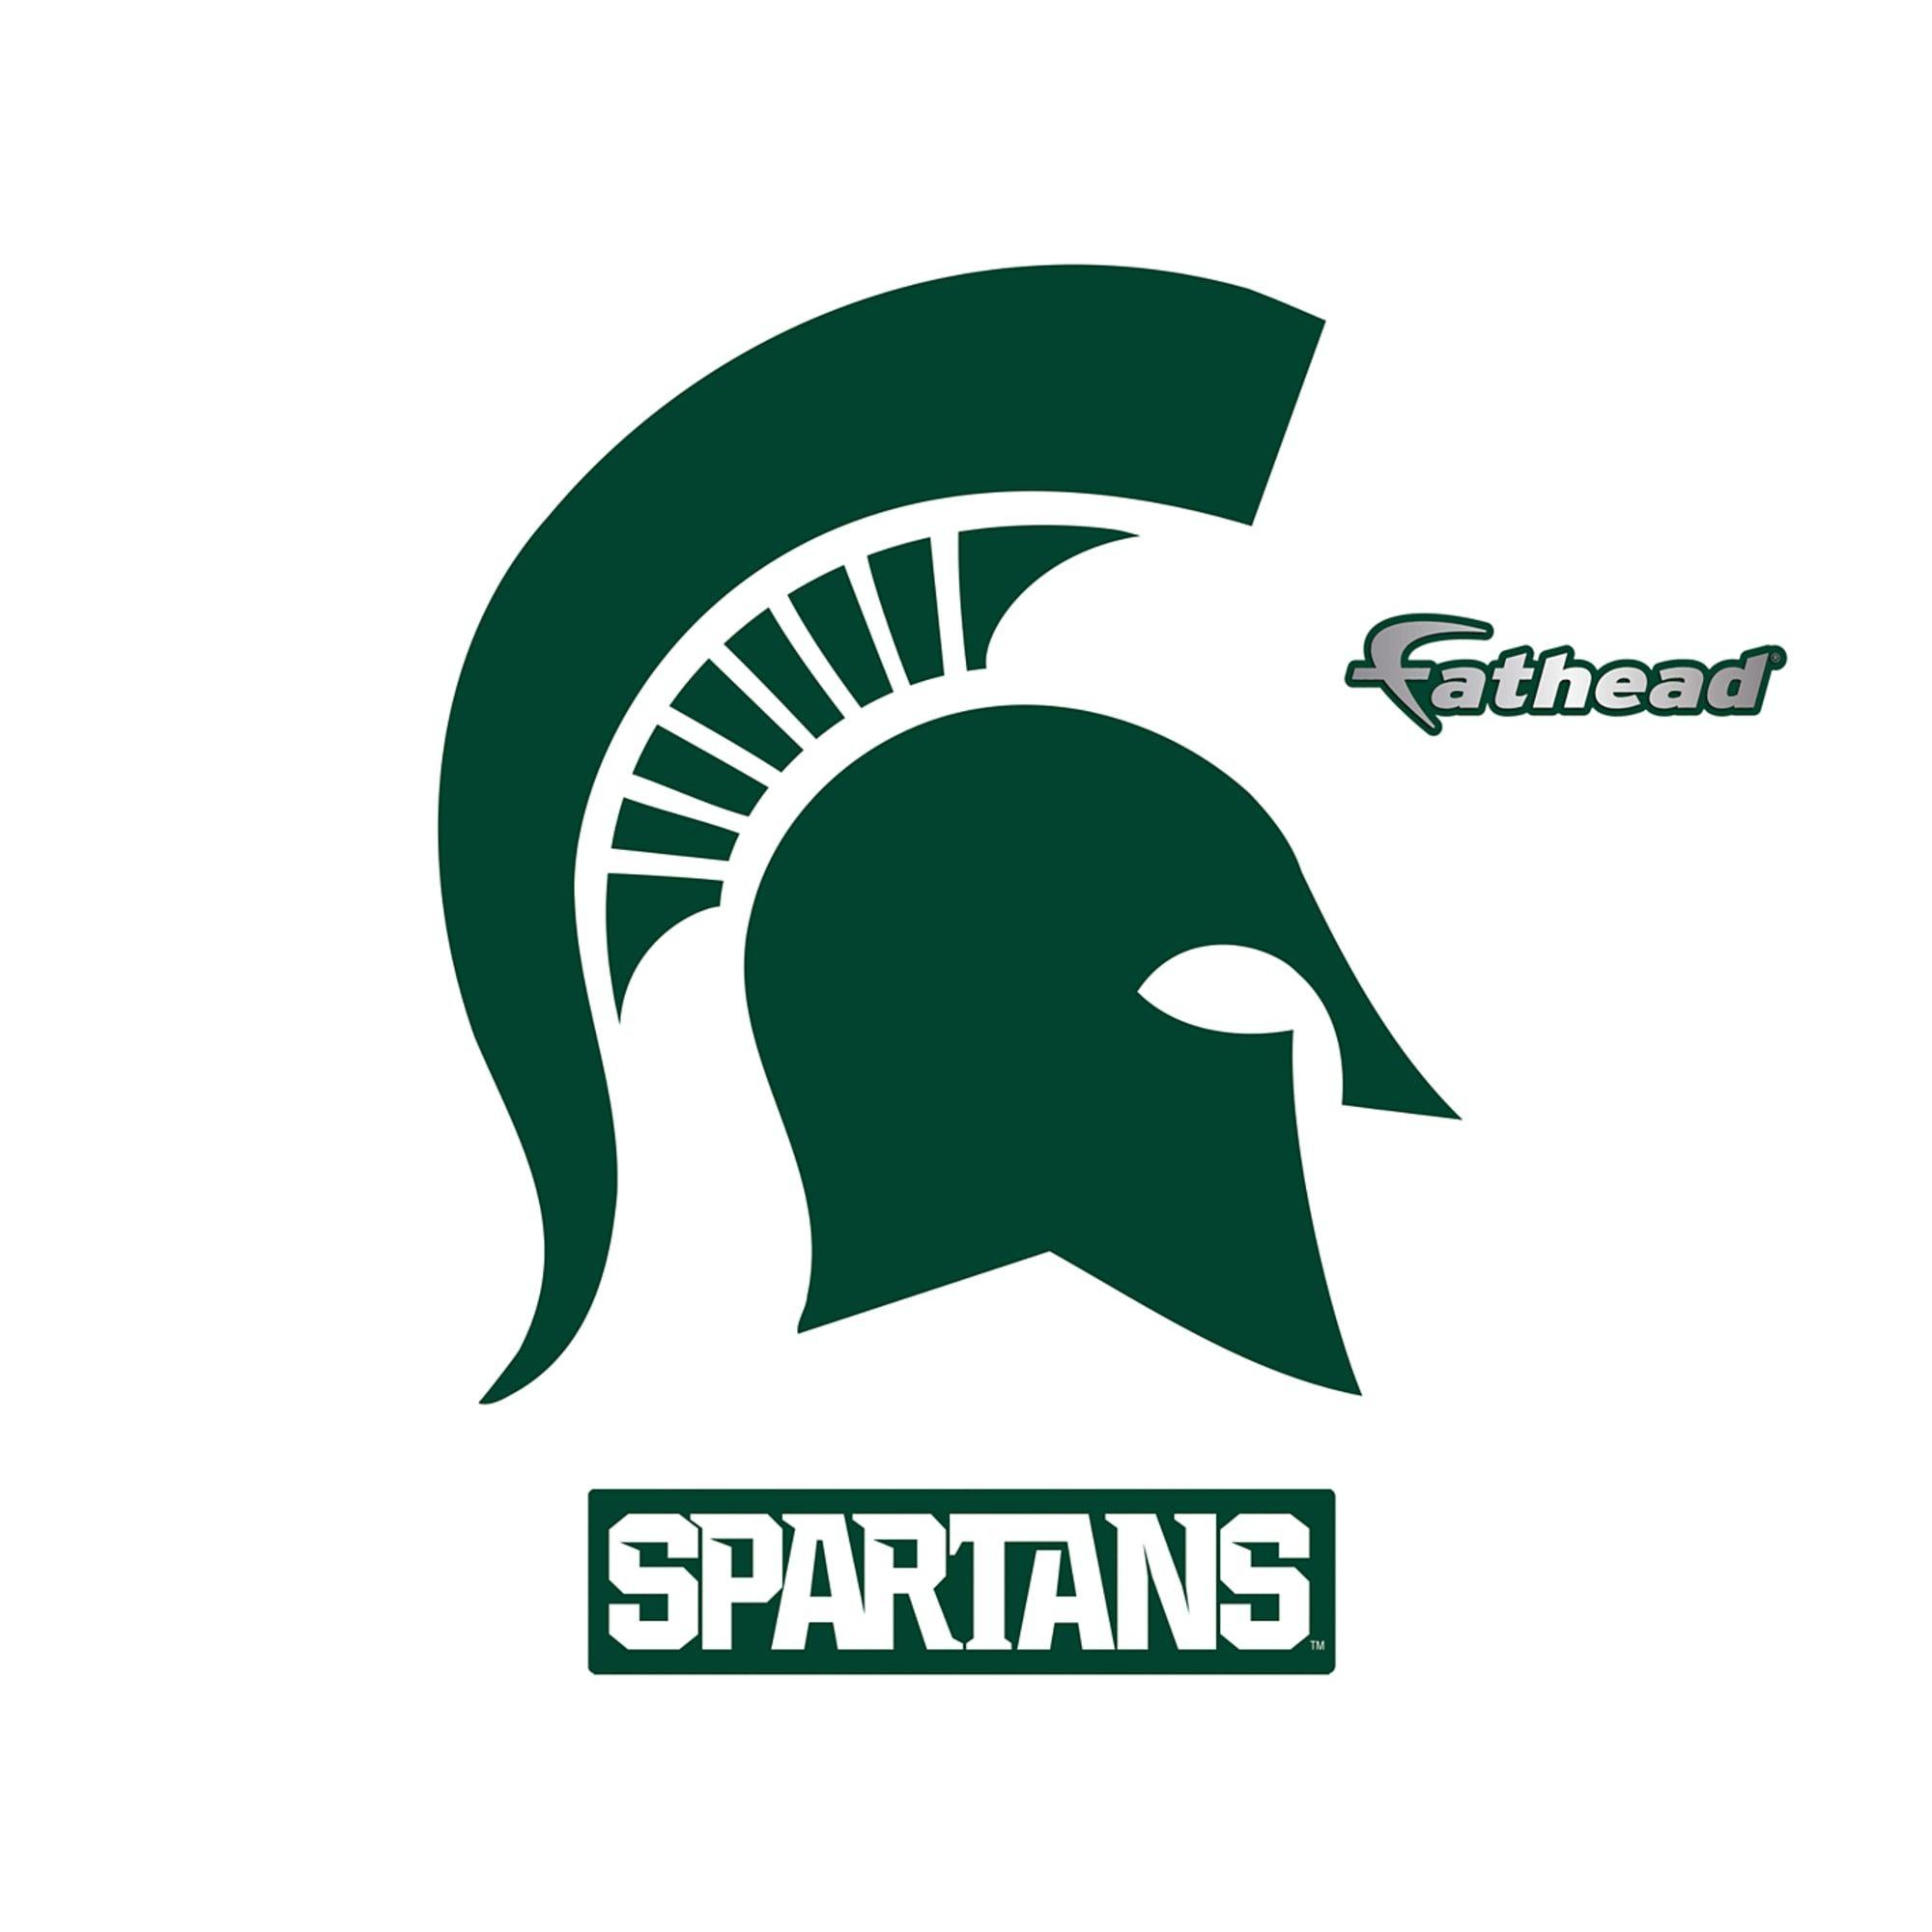 SET of 2 Michigan State University Spartan Logo Cornhole Decals